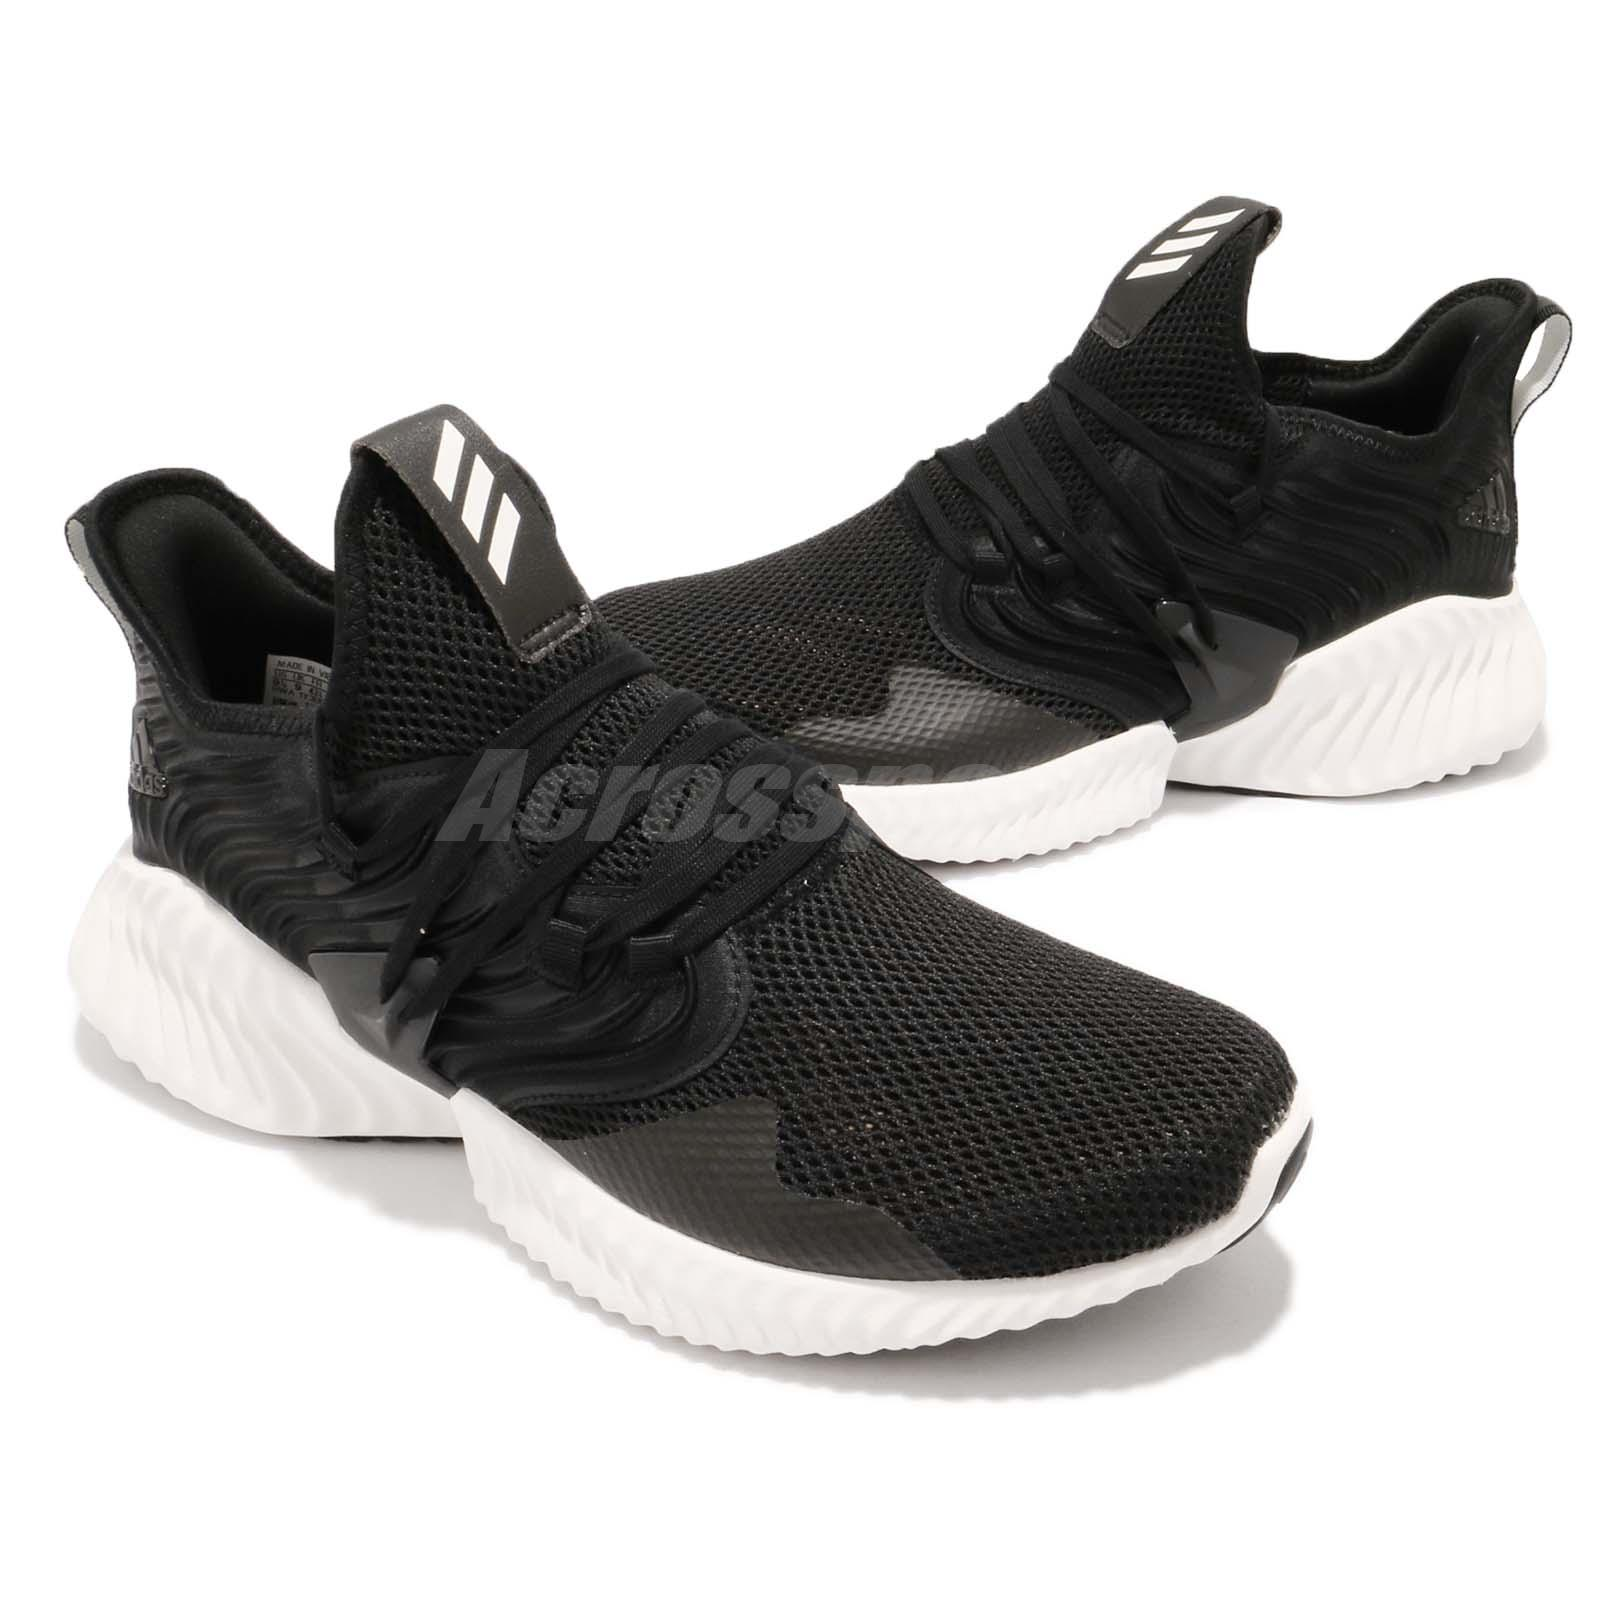 e32f5fb15 adidas Alphabounce Instinct CC M Clima Black White Men Running Shoes ...